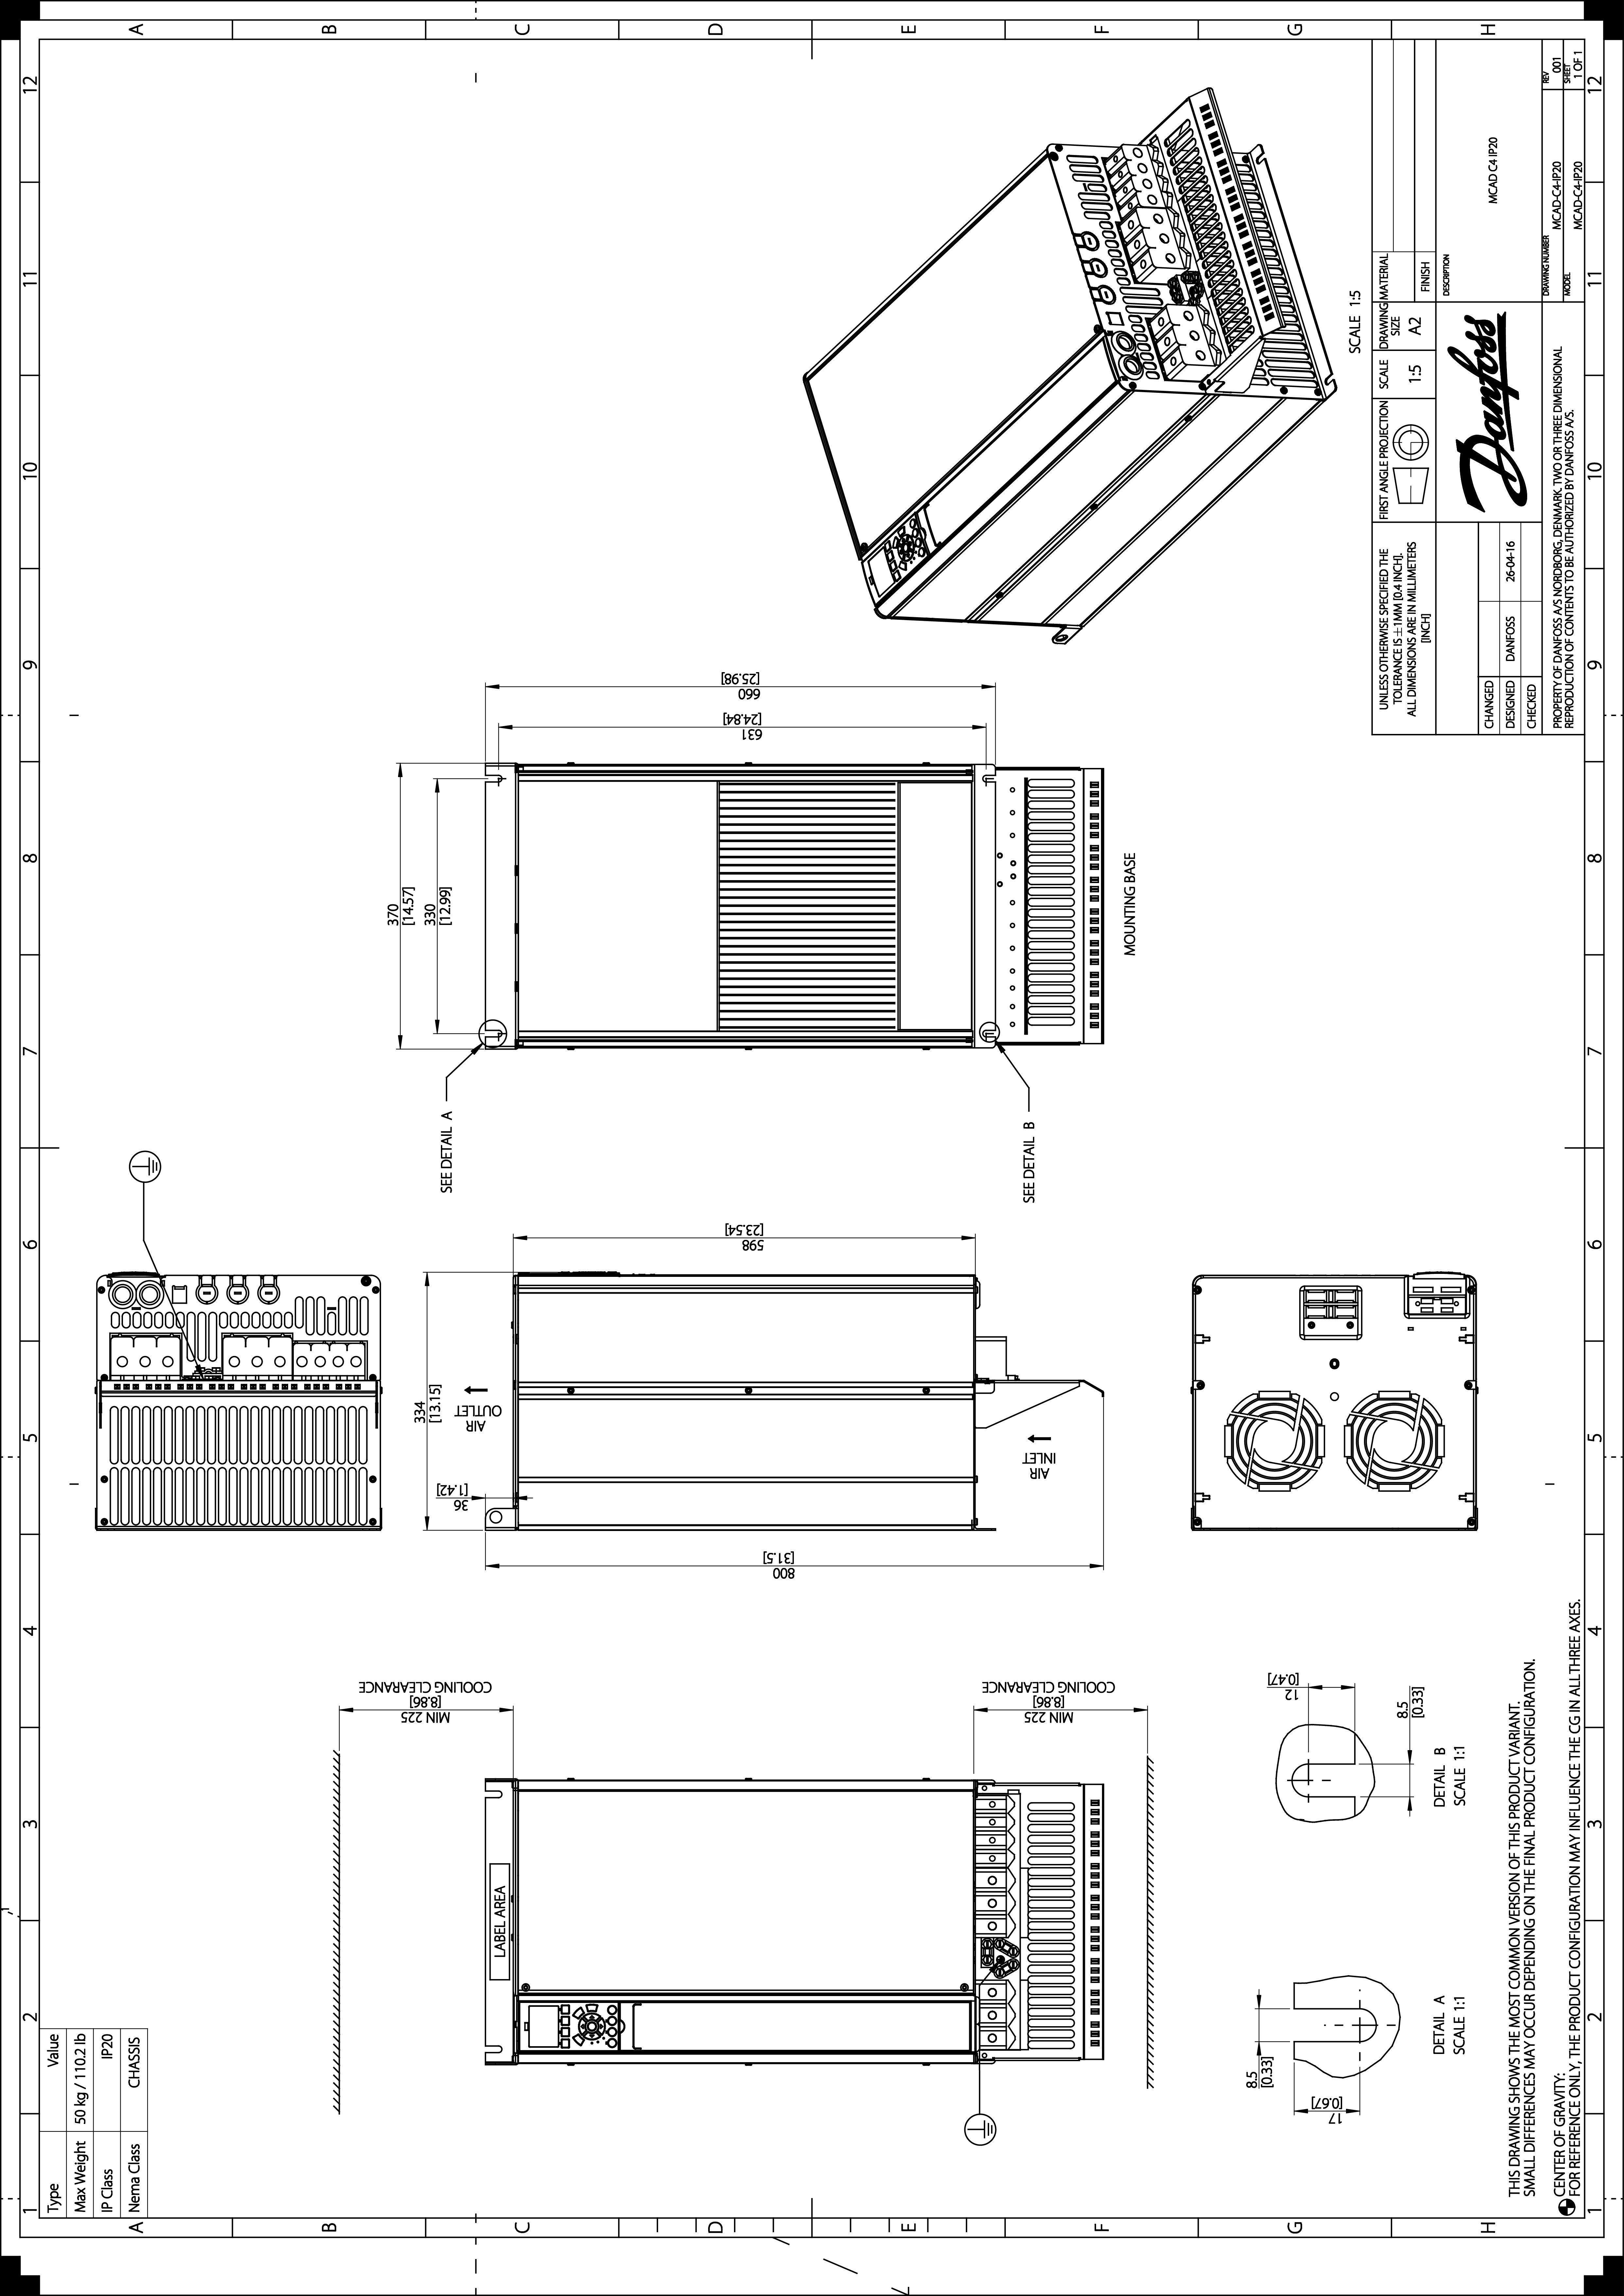 medium resolution of danfoss wiring diagram online wiring diagram ansul wiring diagram danfoss wiring diagram